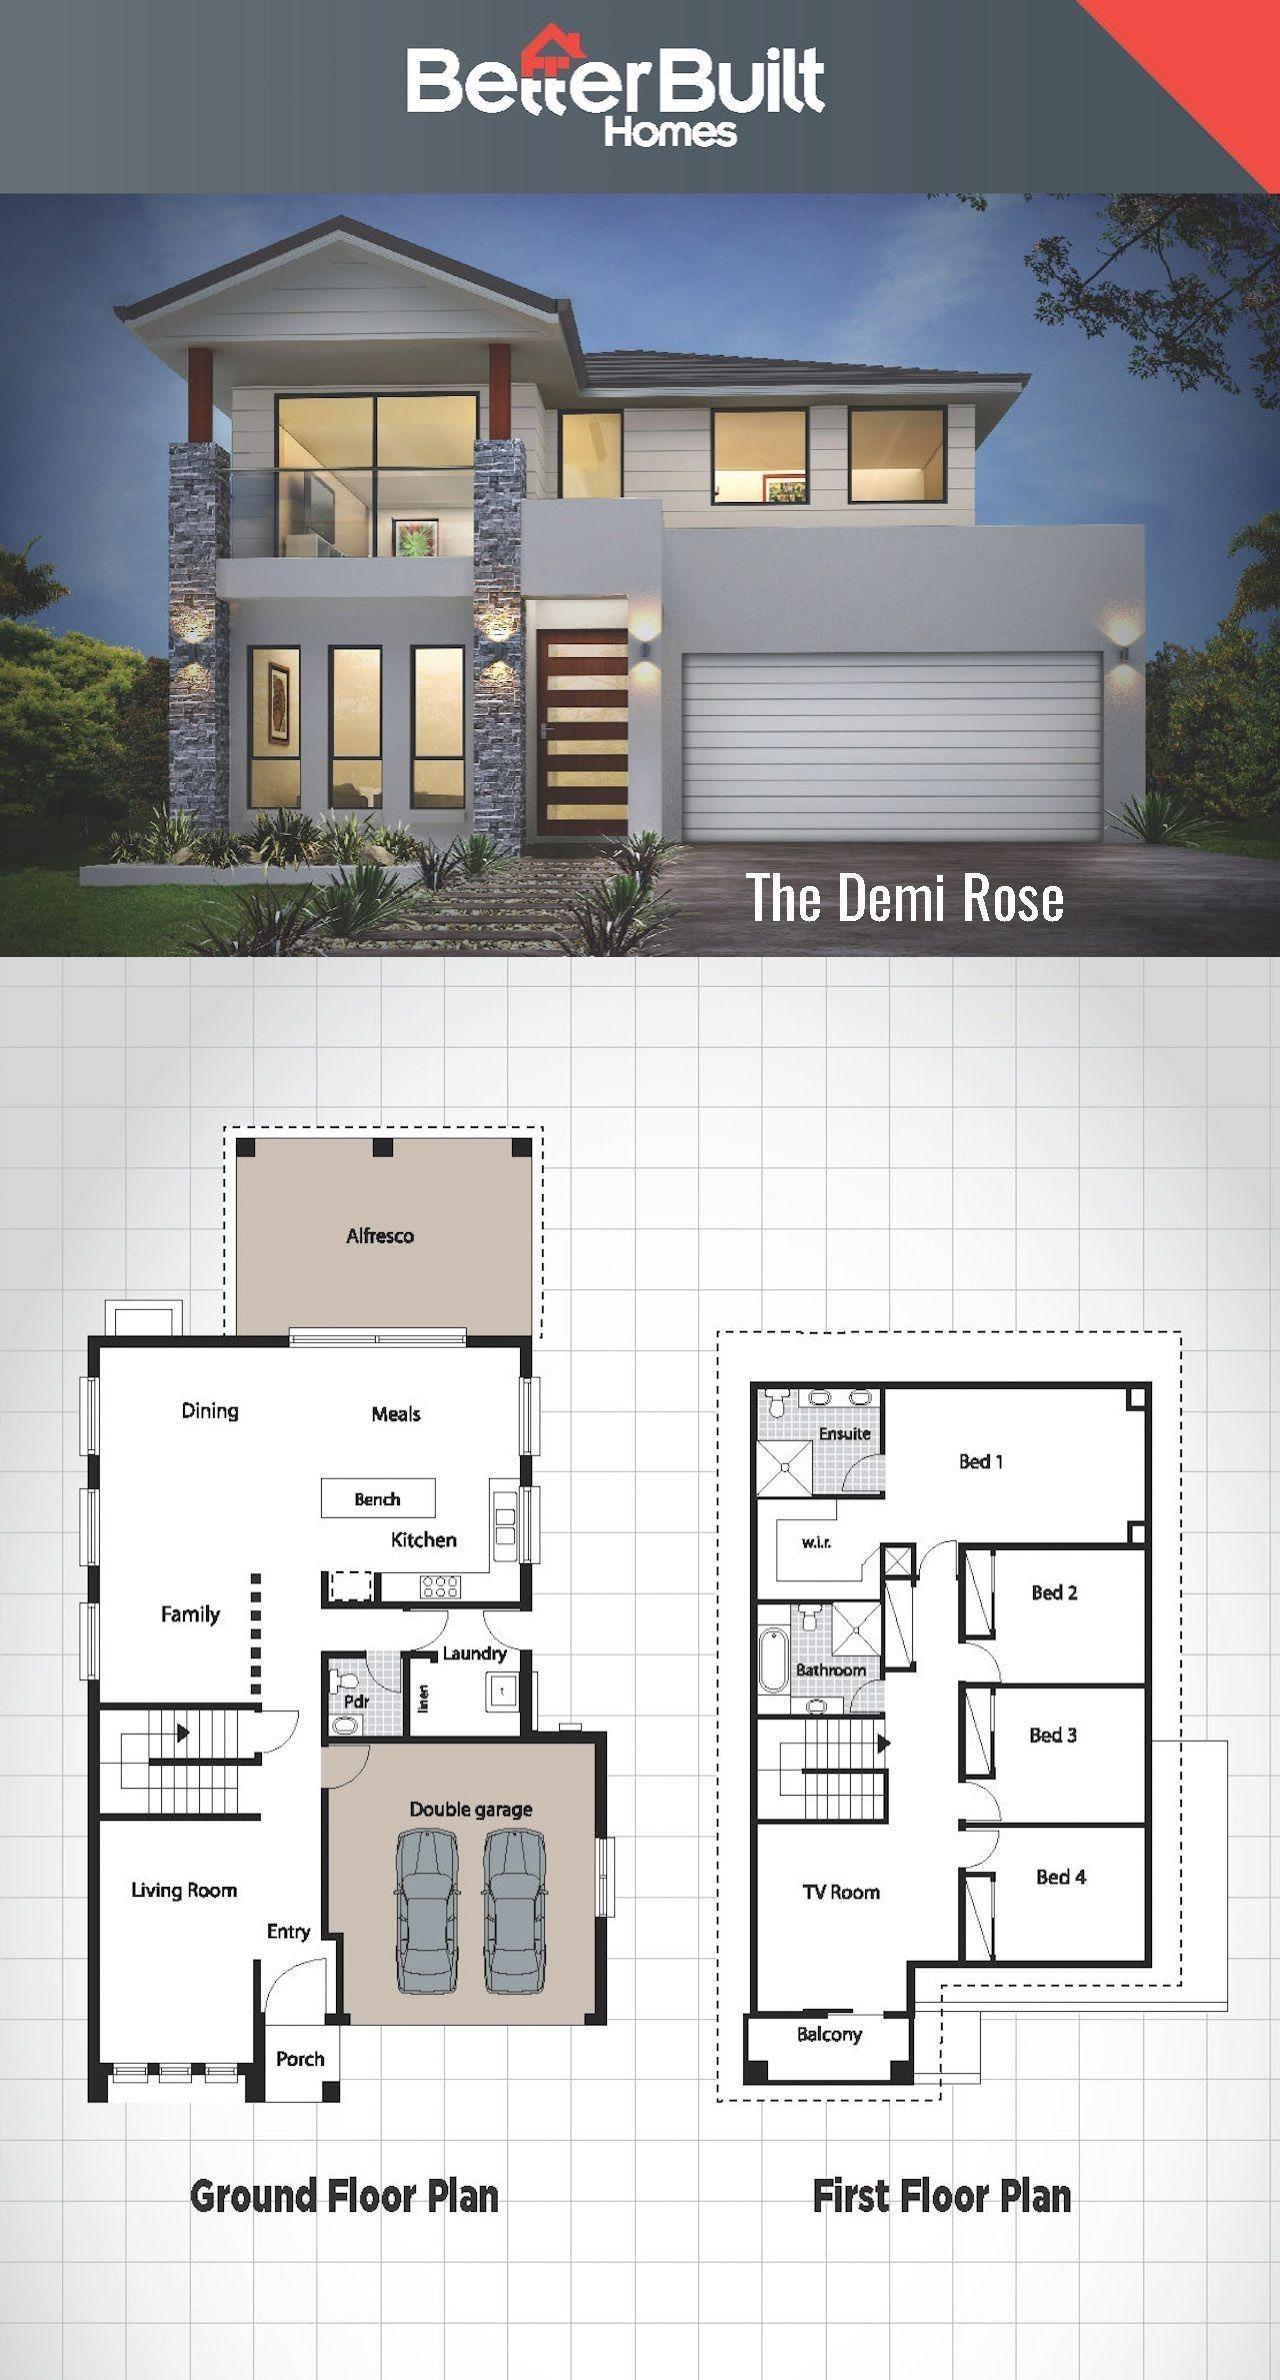 2 Story House Plans With Basement Awesome New 2 Story House Plans Huisplattegronden Plannen Voor Kleine Huizen Luxe Huizen